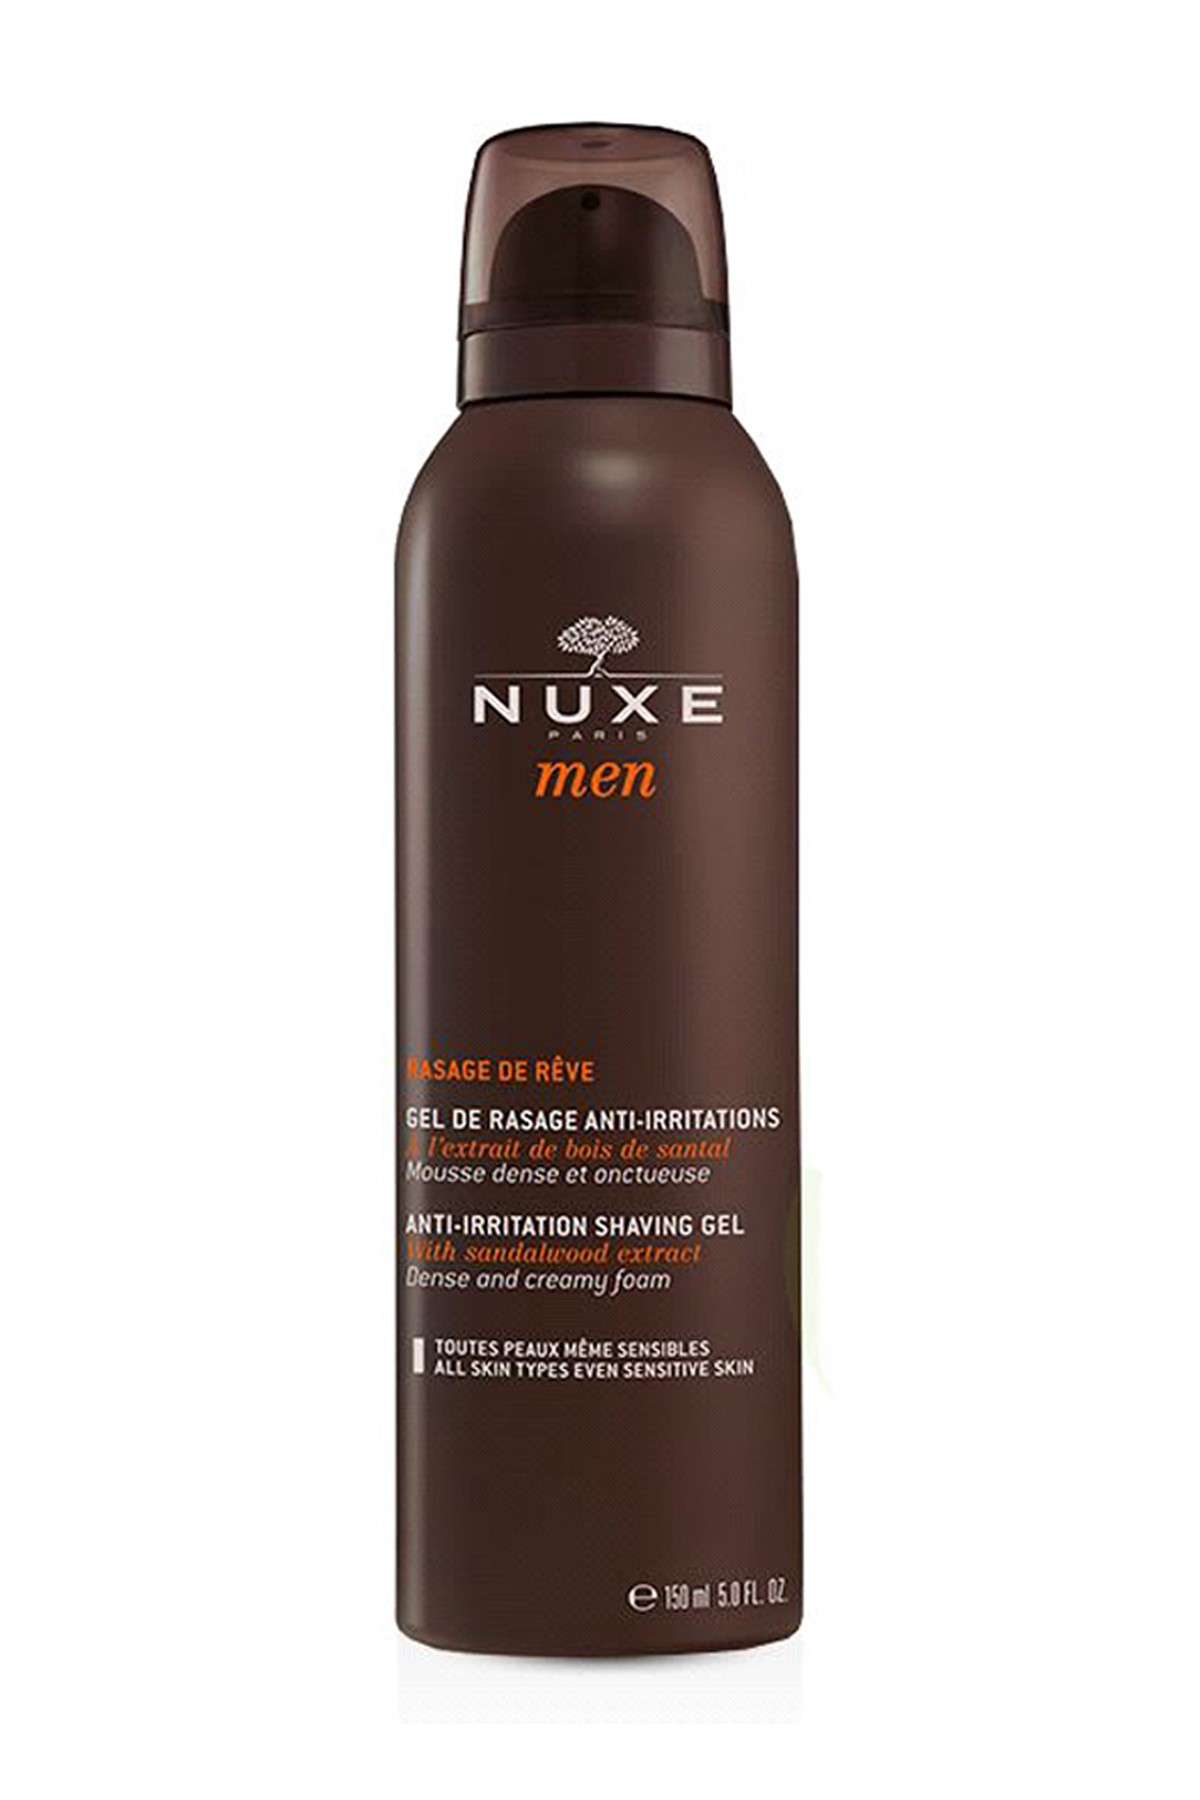 Nuxe Men - Shaving Gel 150 ml